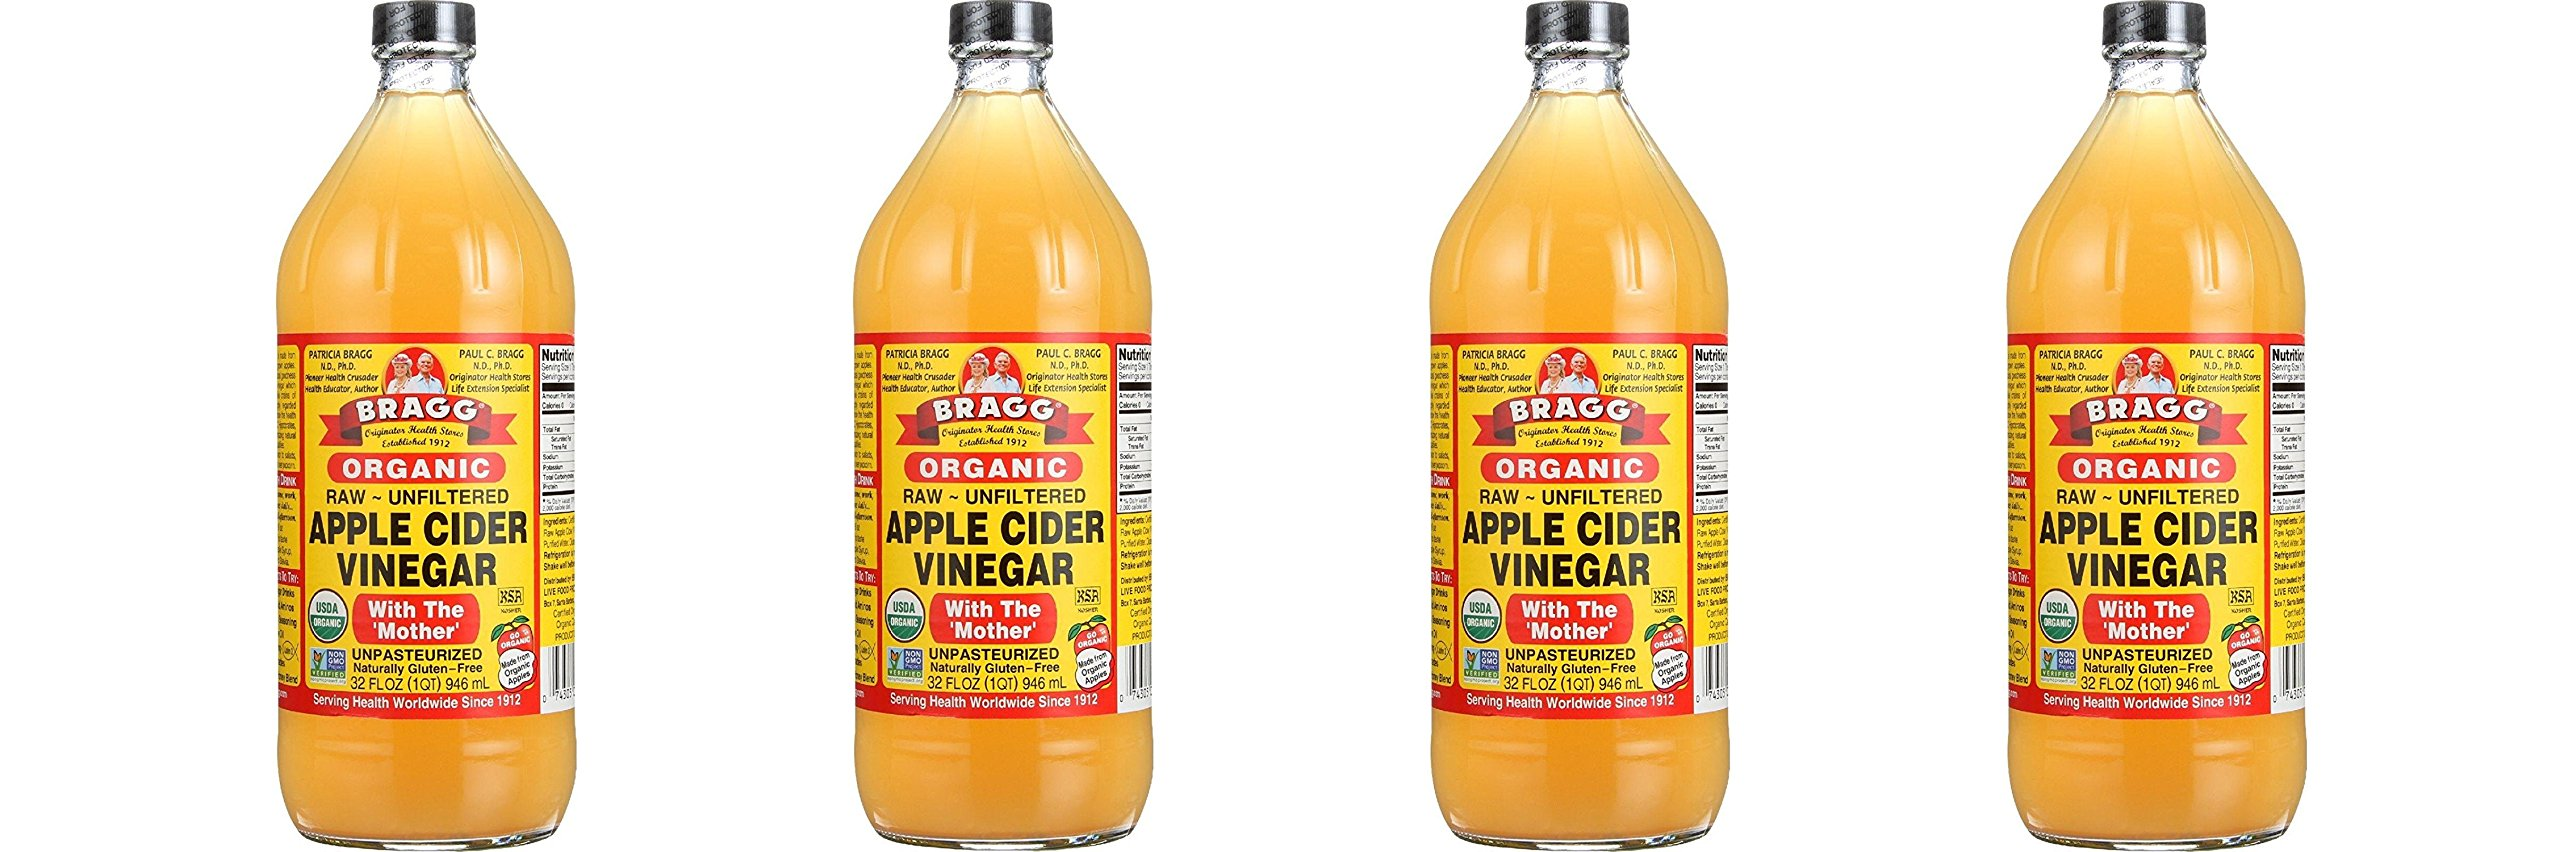 Bragg djpKPe Usda Organic Raw Apple Cider Vinegar, 32 oz (4 Pack)